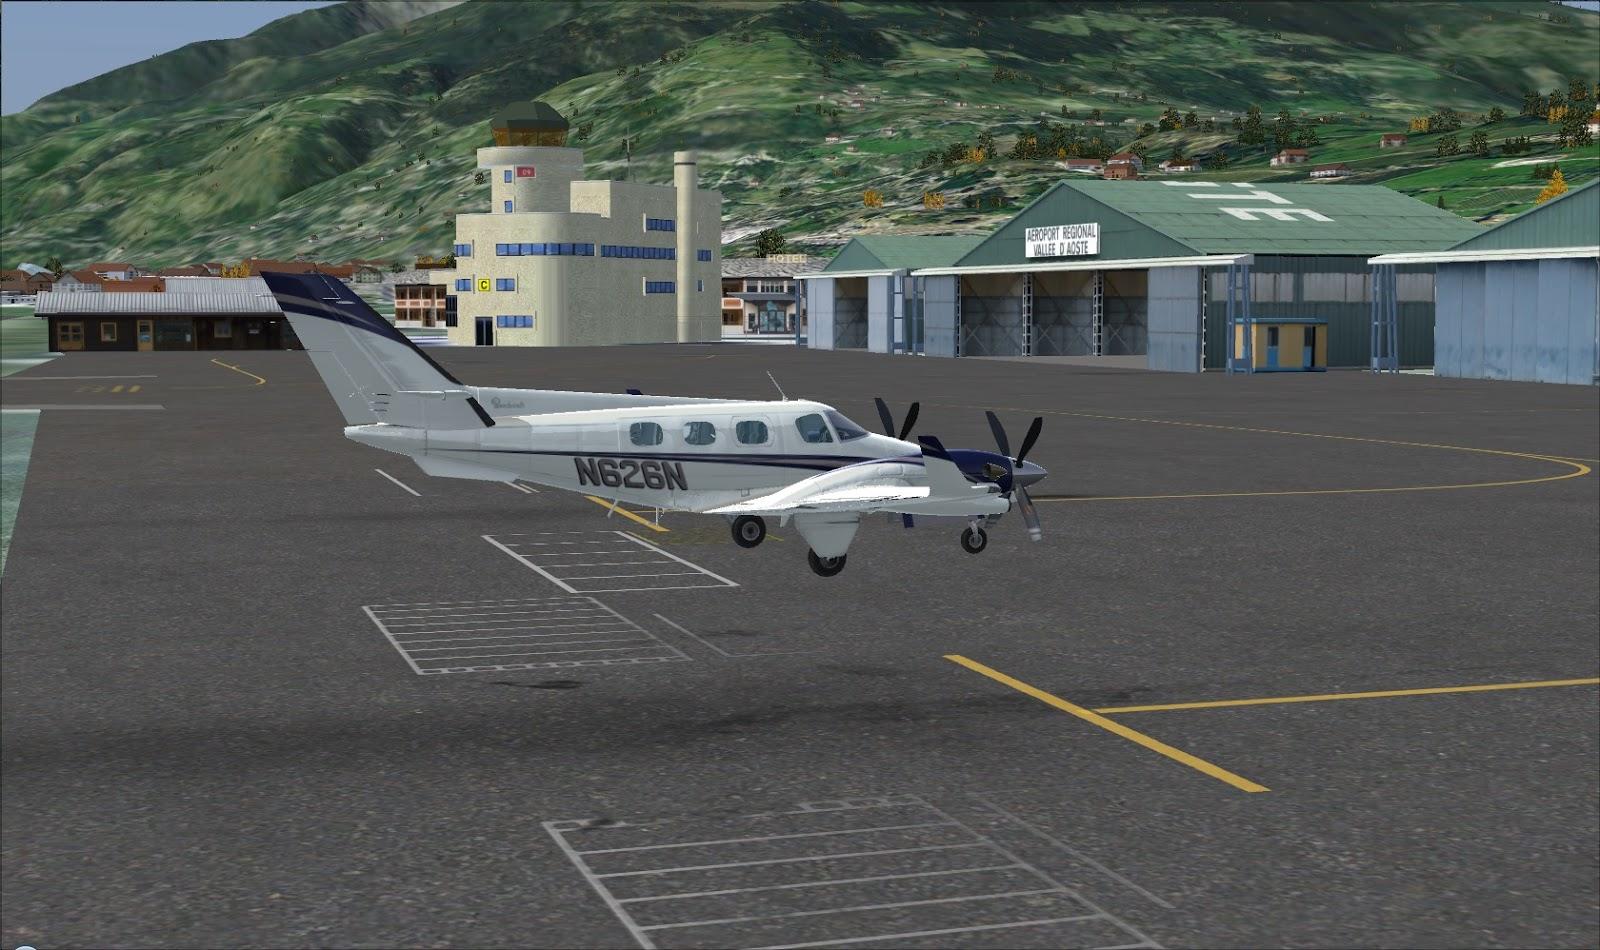 Aeroporto Aosta : Flysimreal fsx addon questo sconosciuto ^ parte